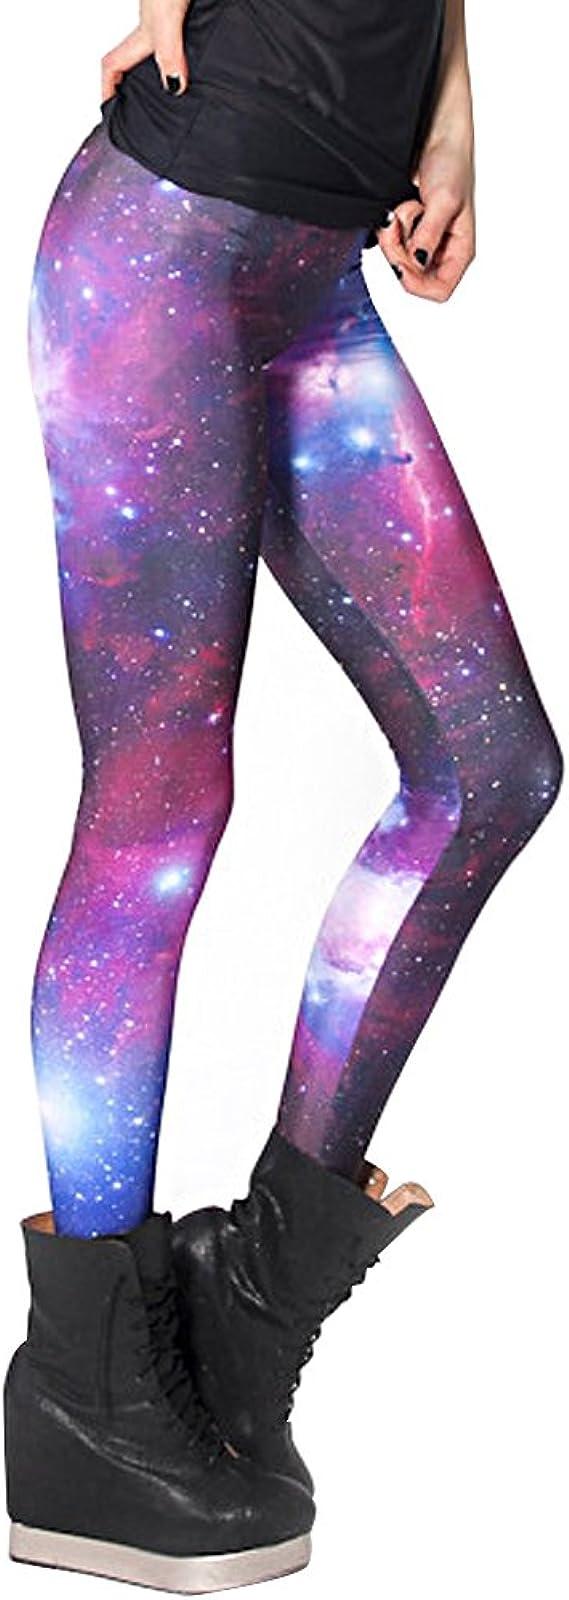 AONER Damen Galaxy Leggings Skinny Elastische Leggins Einheitsgr/ö/ße Frau Galaxie Space Patterned Weltraum Weltall Sternenhimmel Print Style Stretch